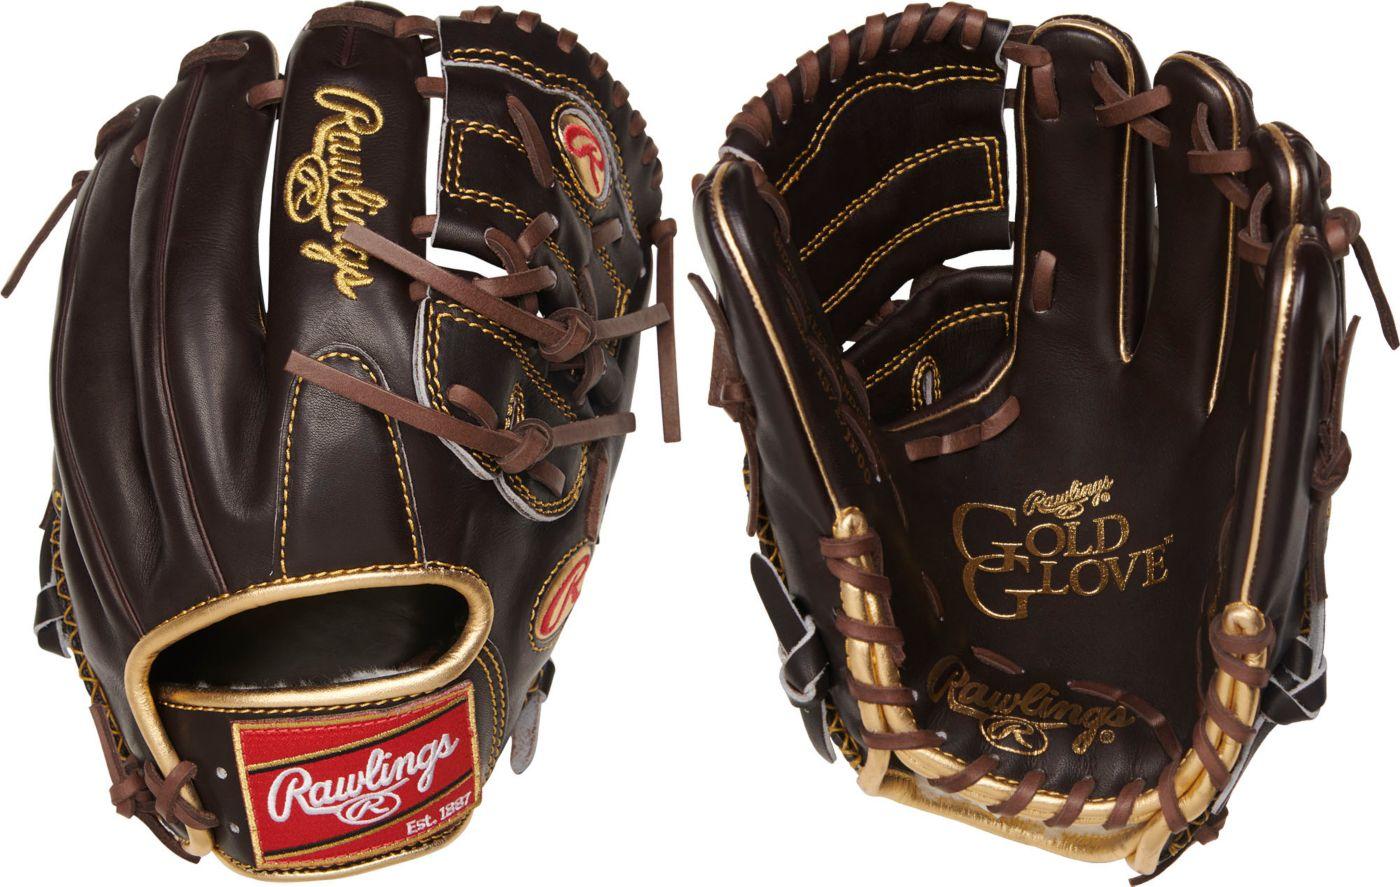 Rawlings 11.75'' Gold Glove Series